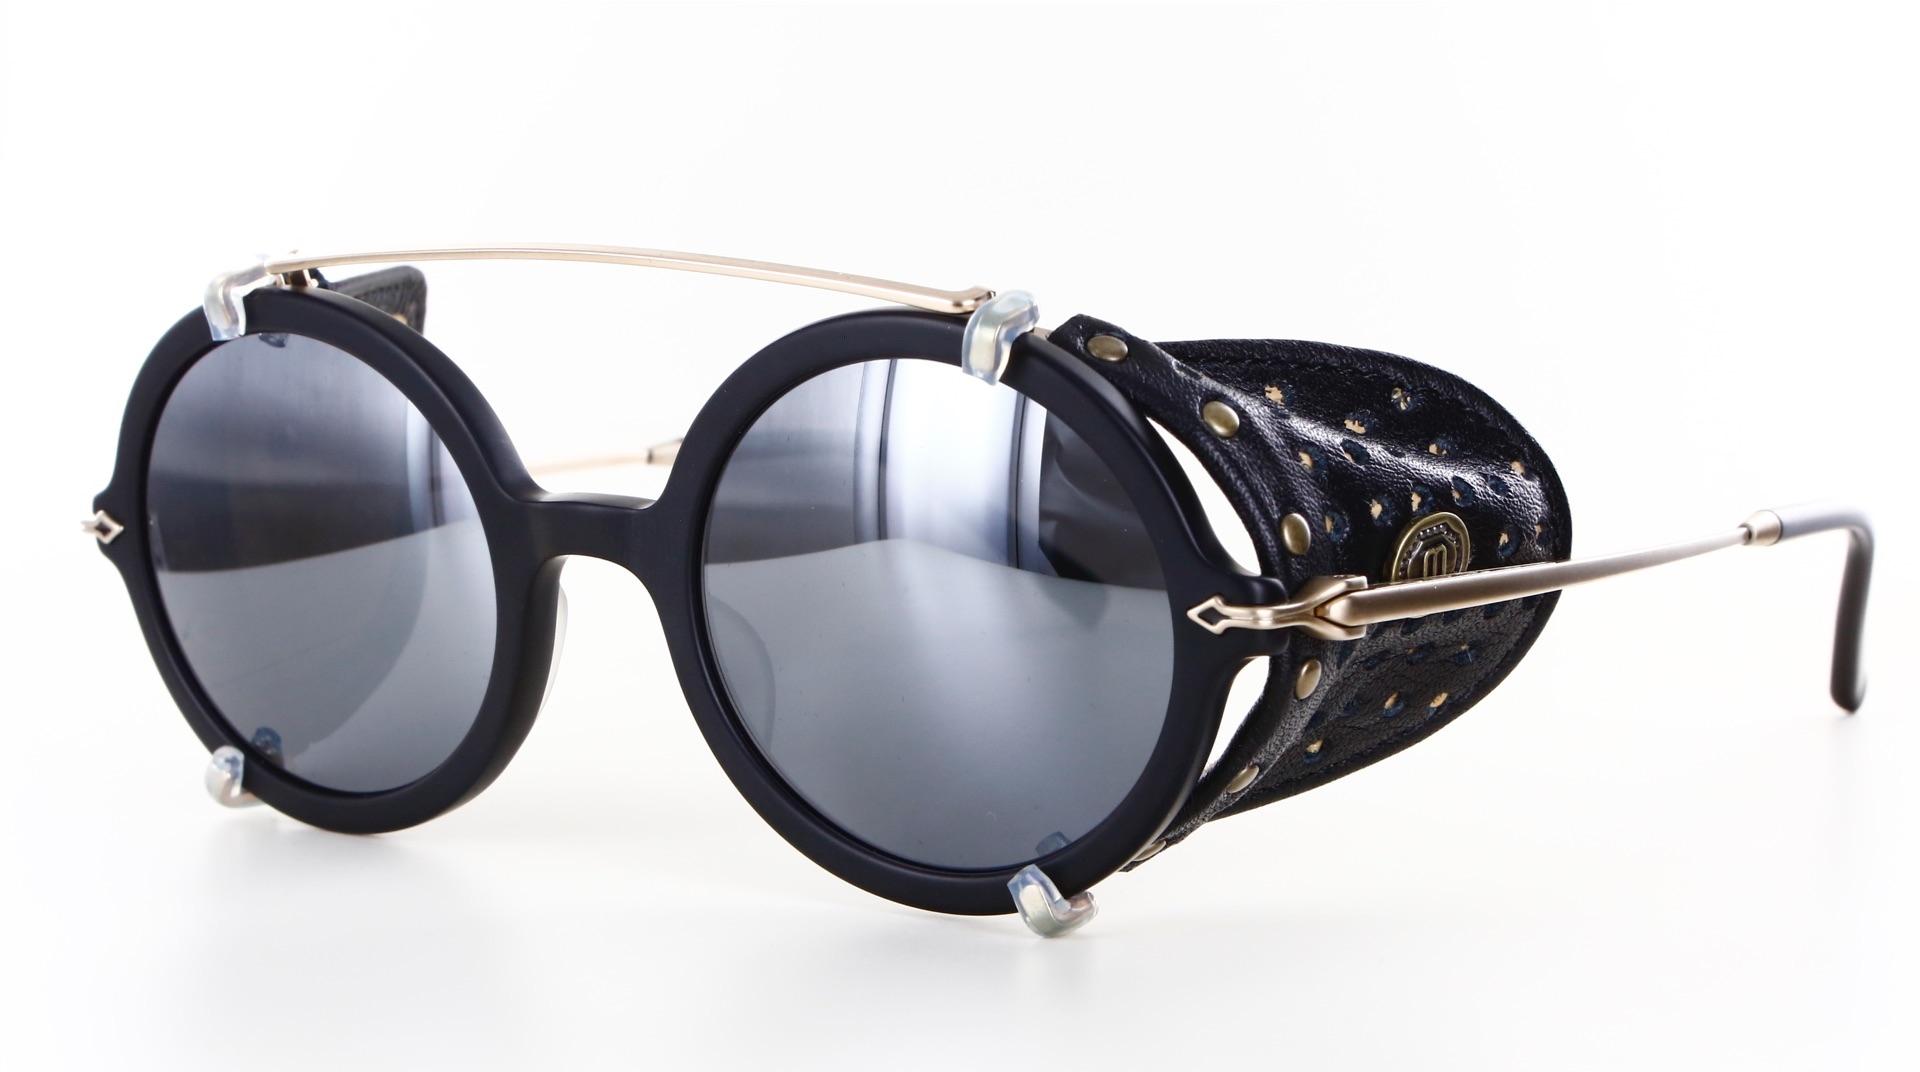 2965287ab399 Matsuda sunglasses - ref  78177